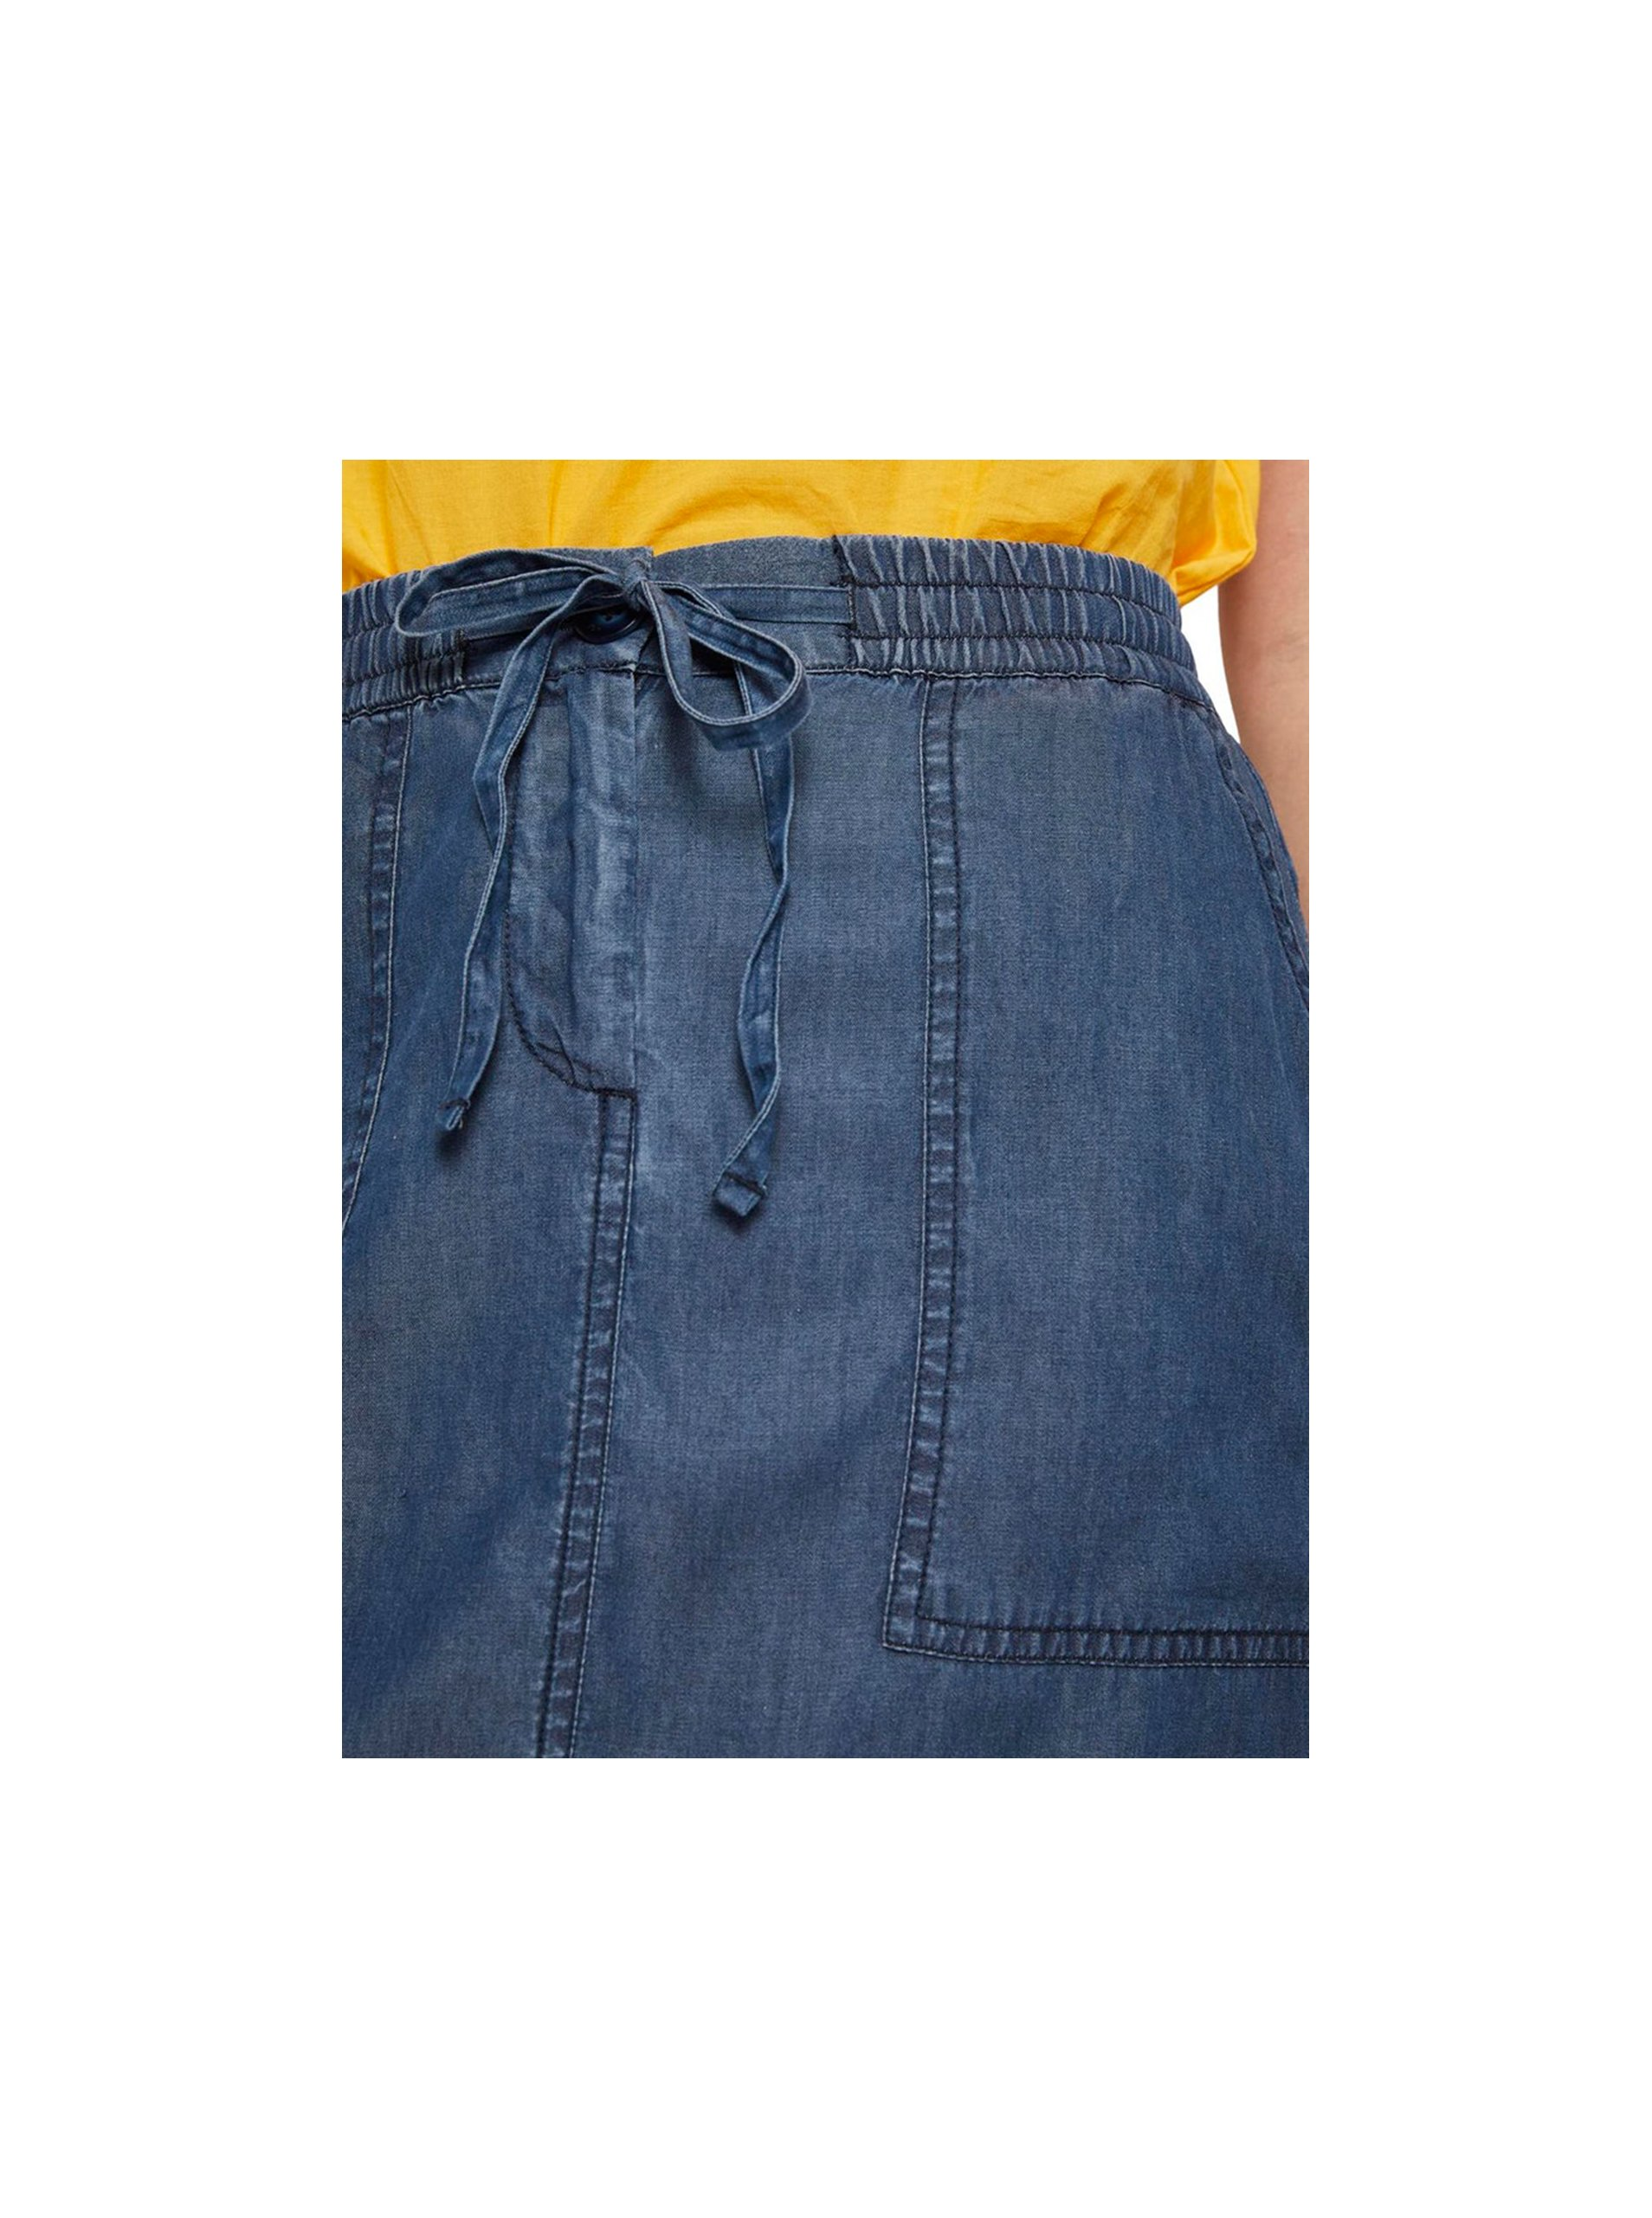 Modrá dámska rifľová sukňa Tom Tailor.